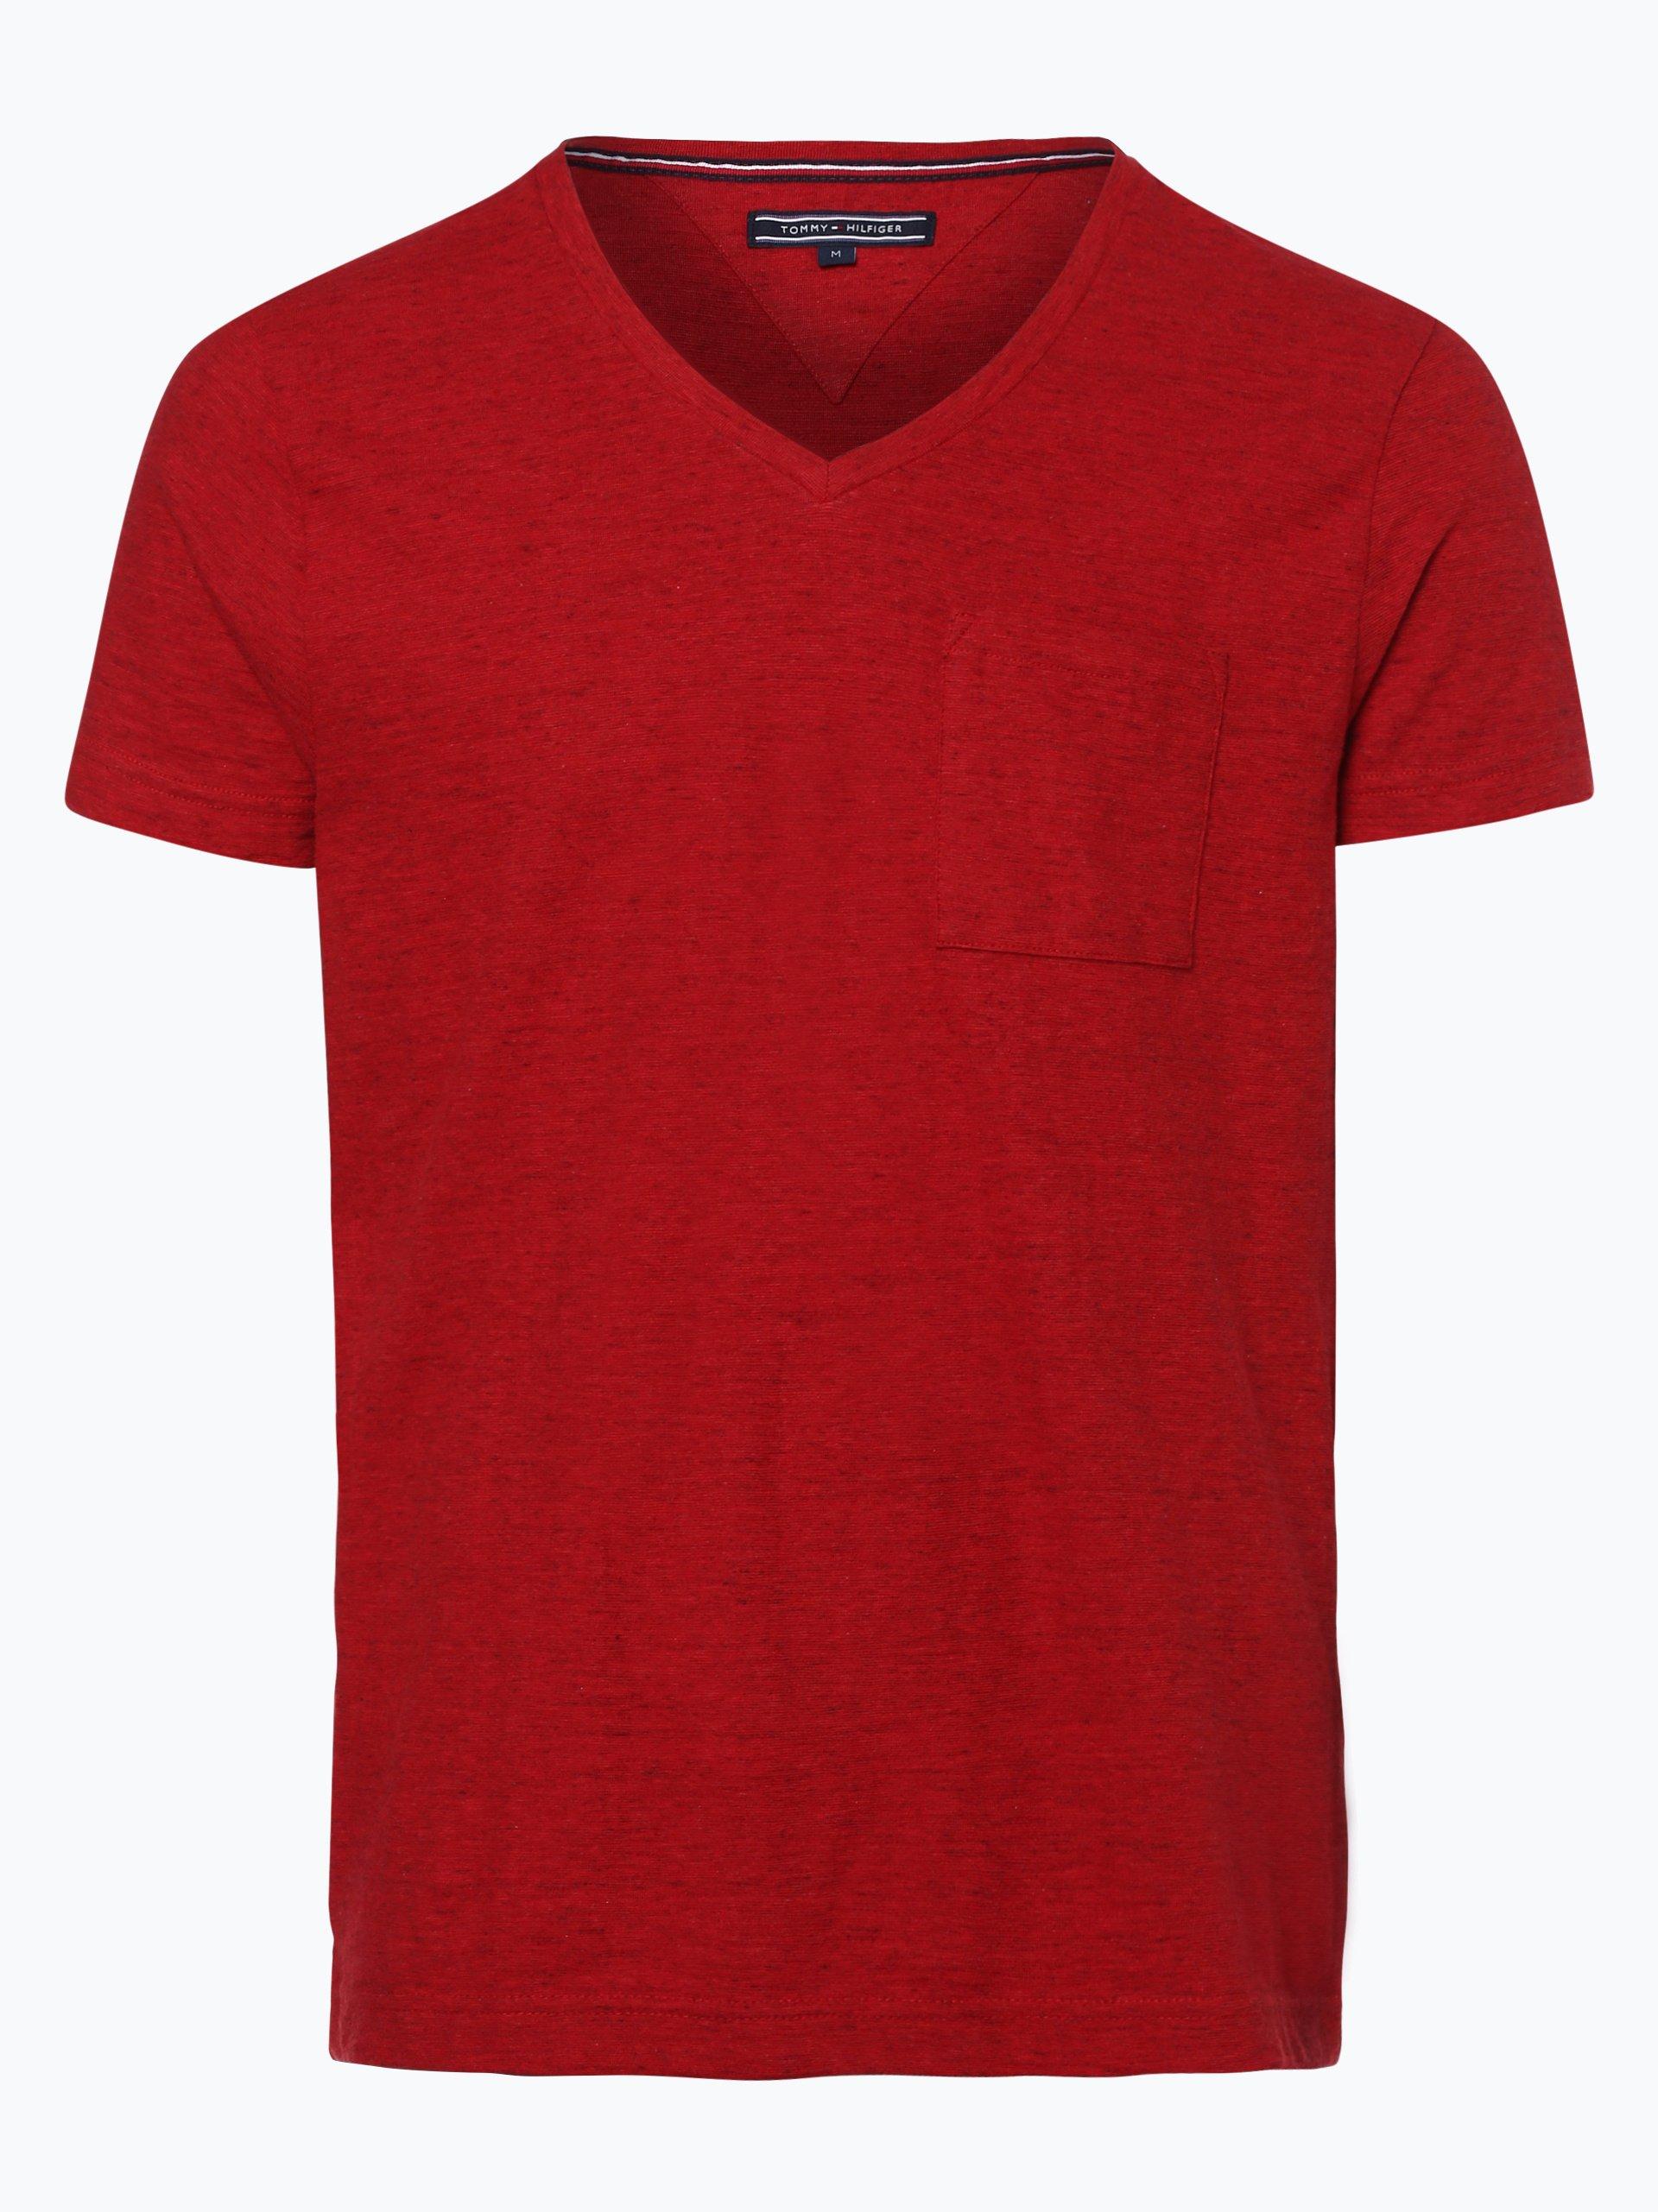 tommy hilfiger herren t shirt rot uni online kaufen peek. Black Bedroom Furniture Sets. Home Design Ideas